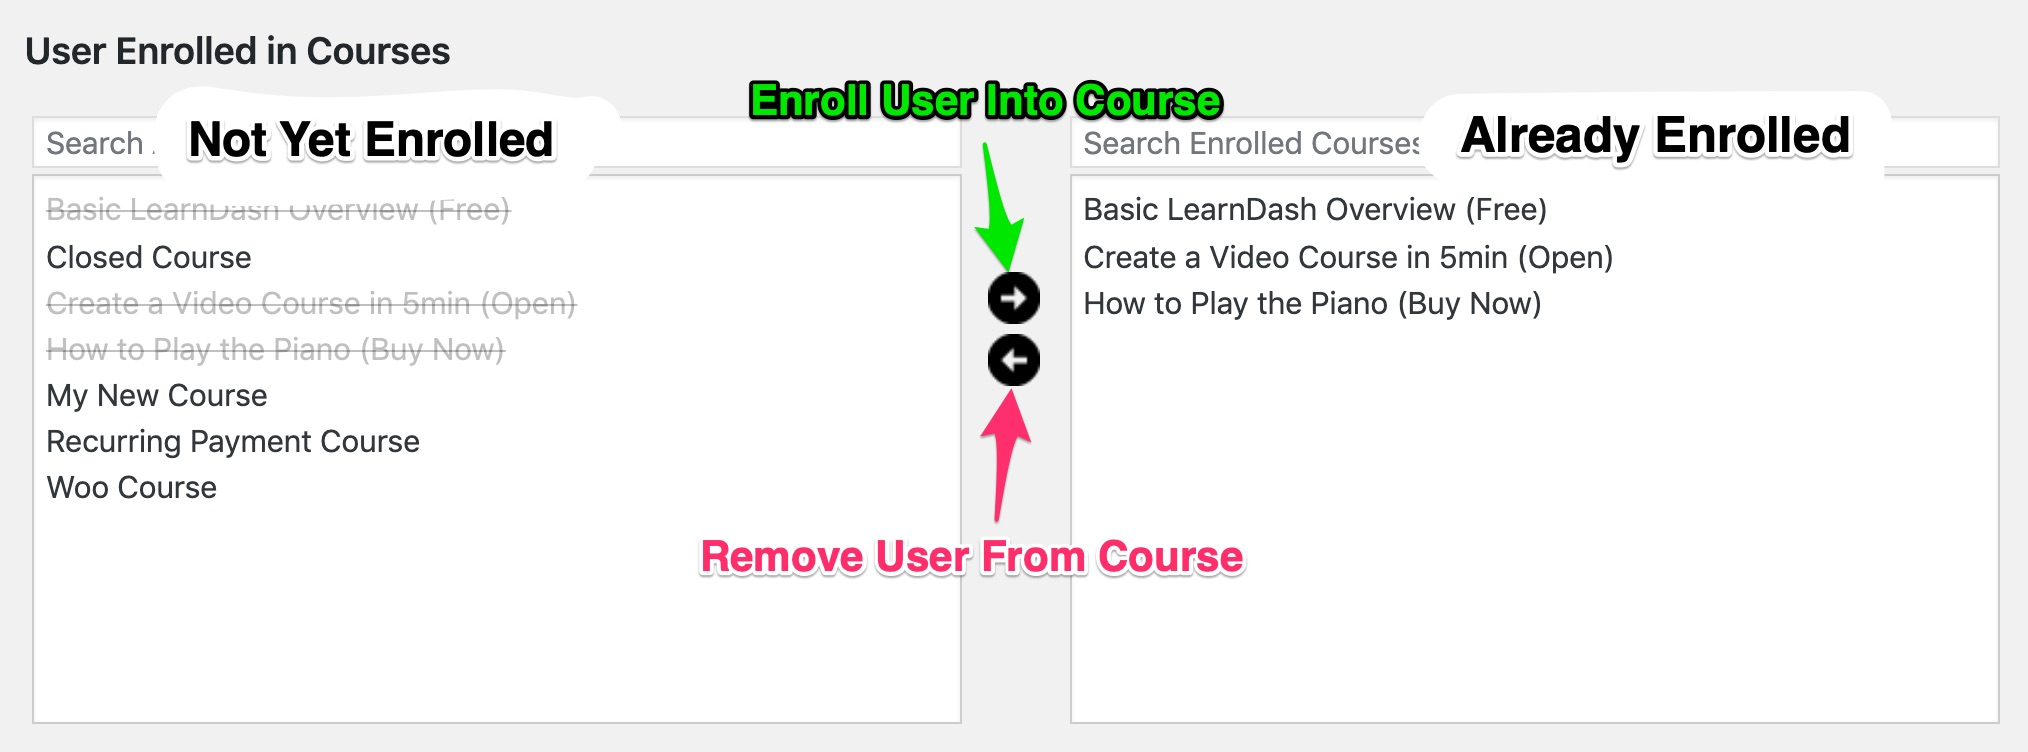 LearnDash user enrolled in courses, management